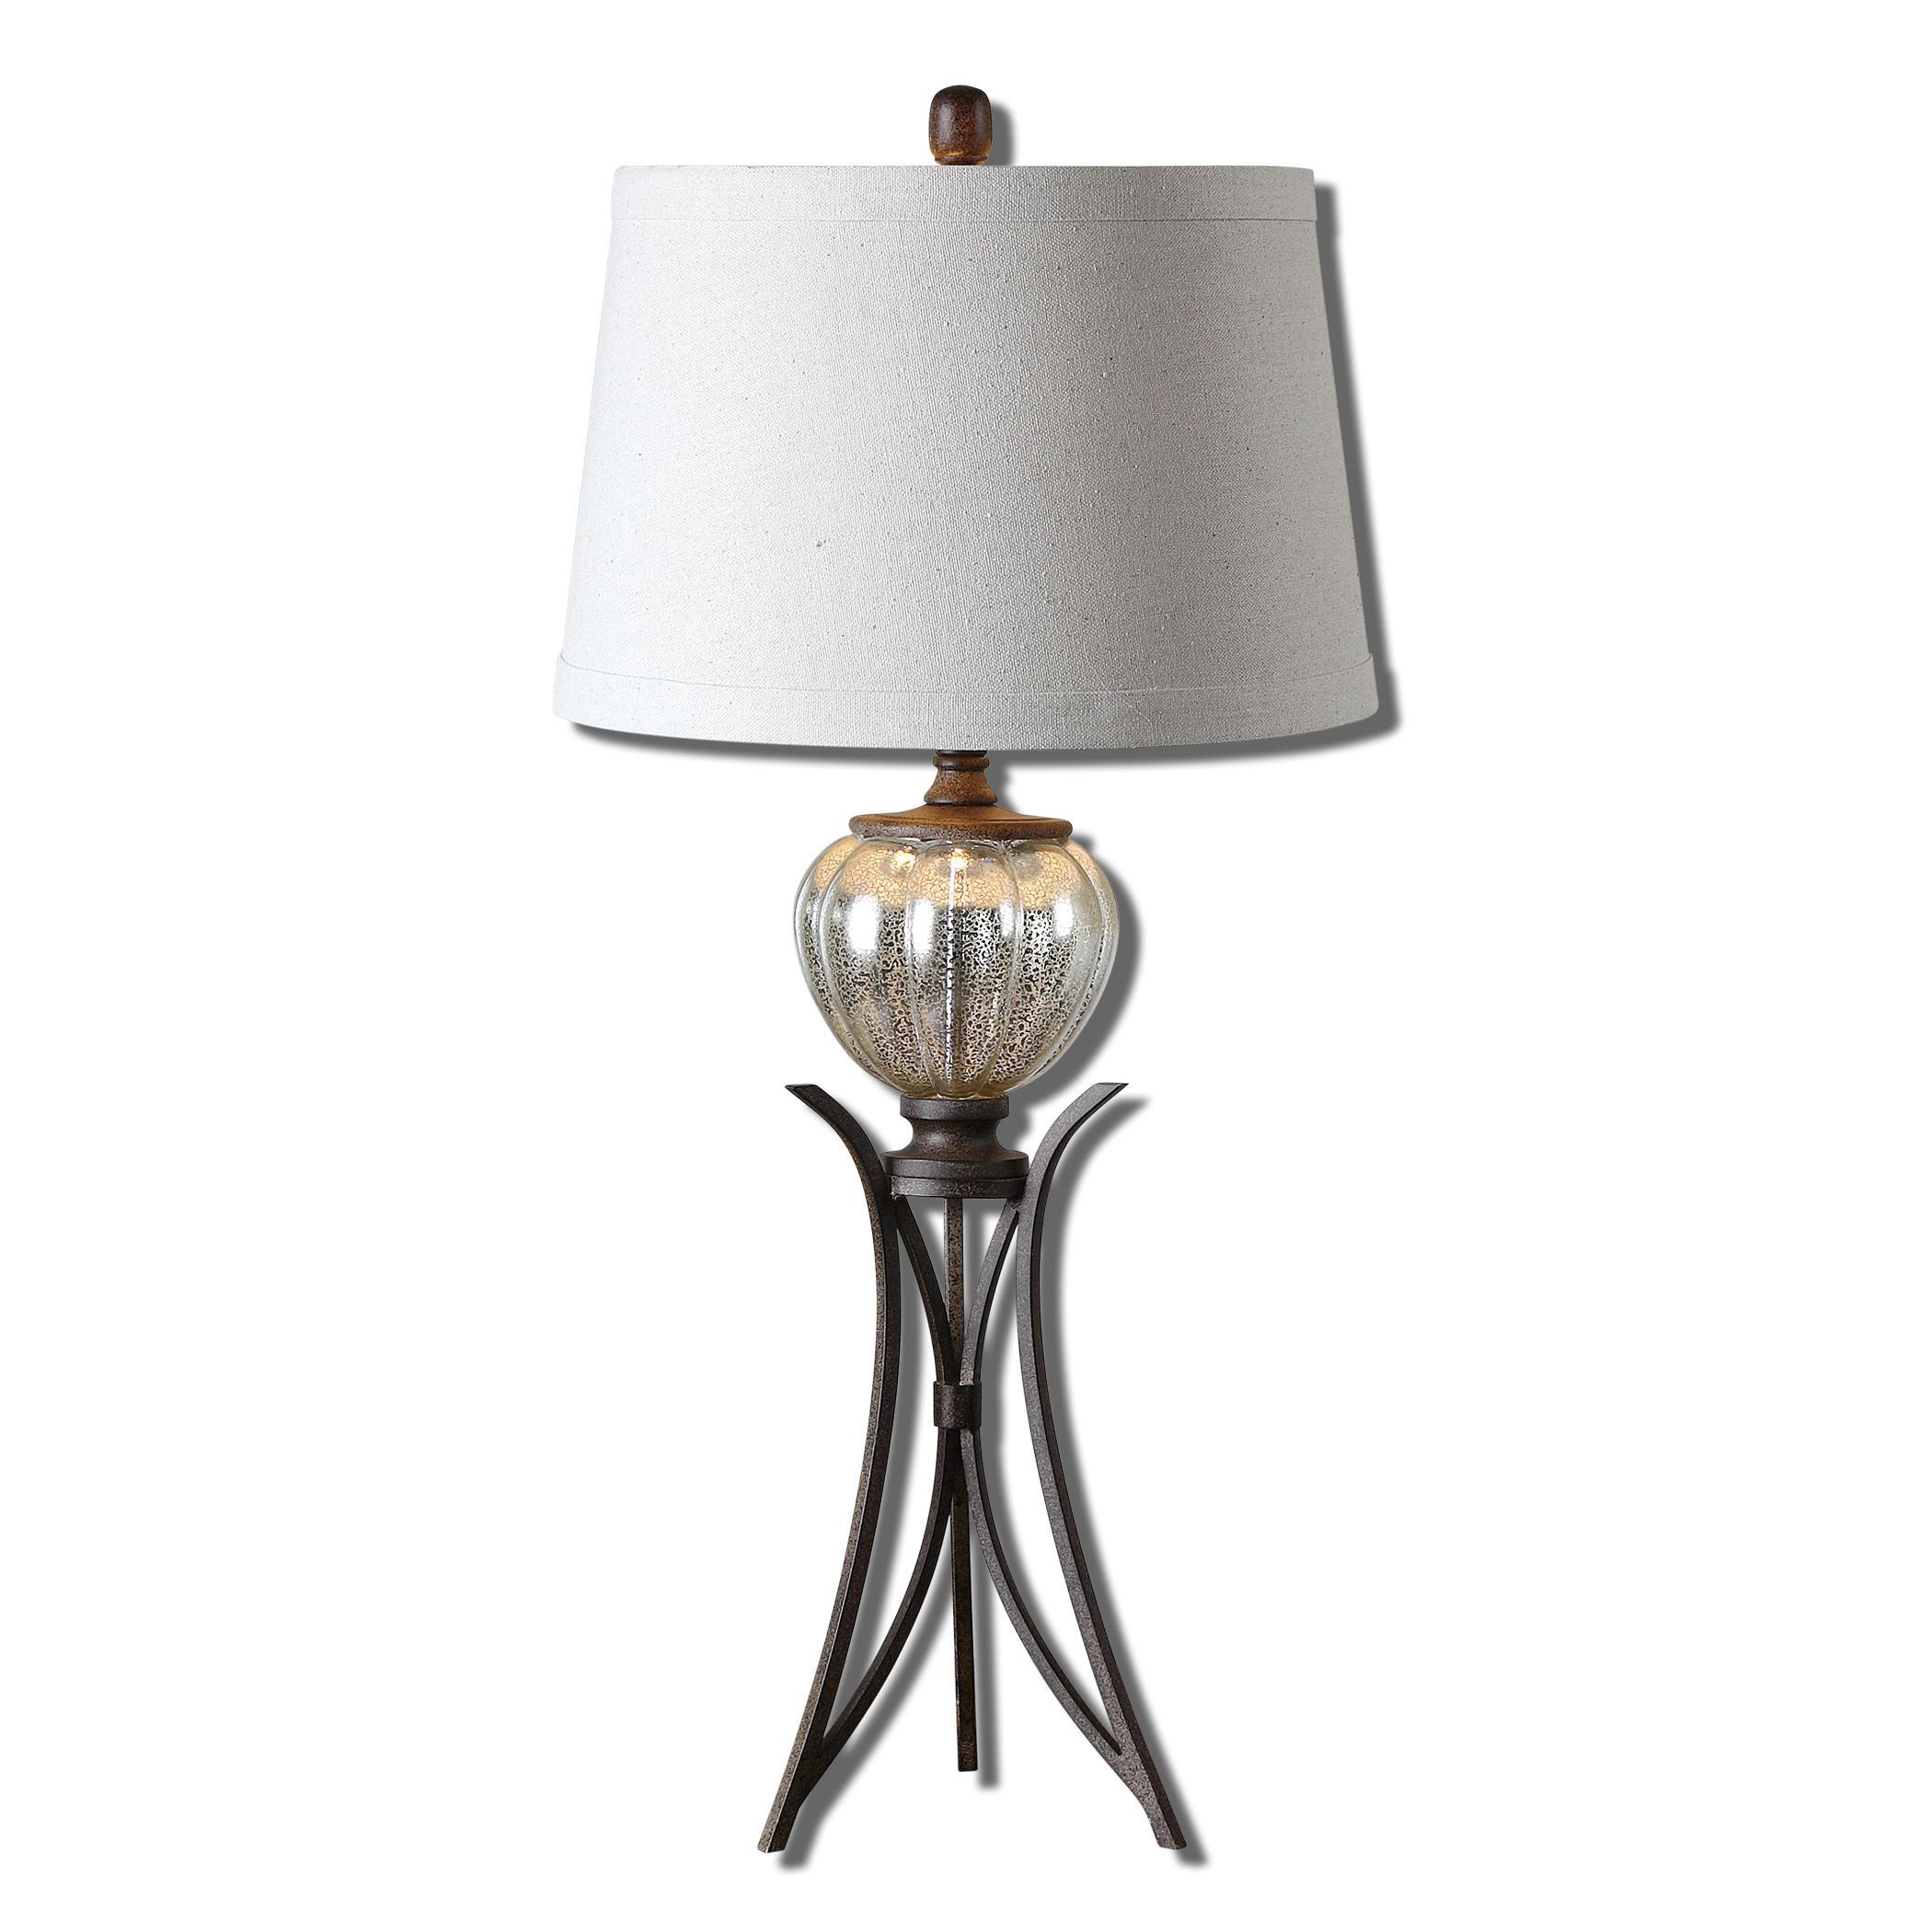 Cebrario Mercury Glass Table Lamp